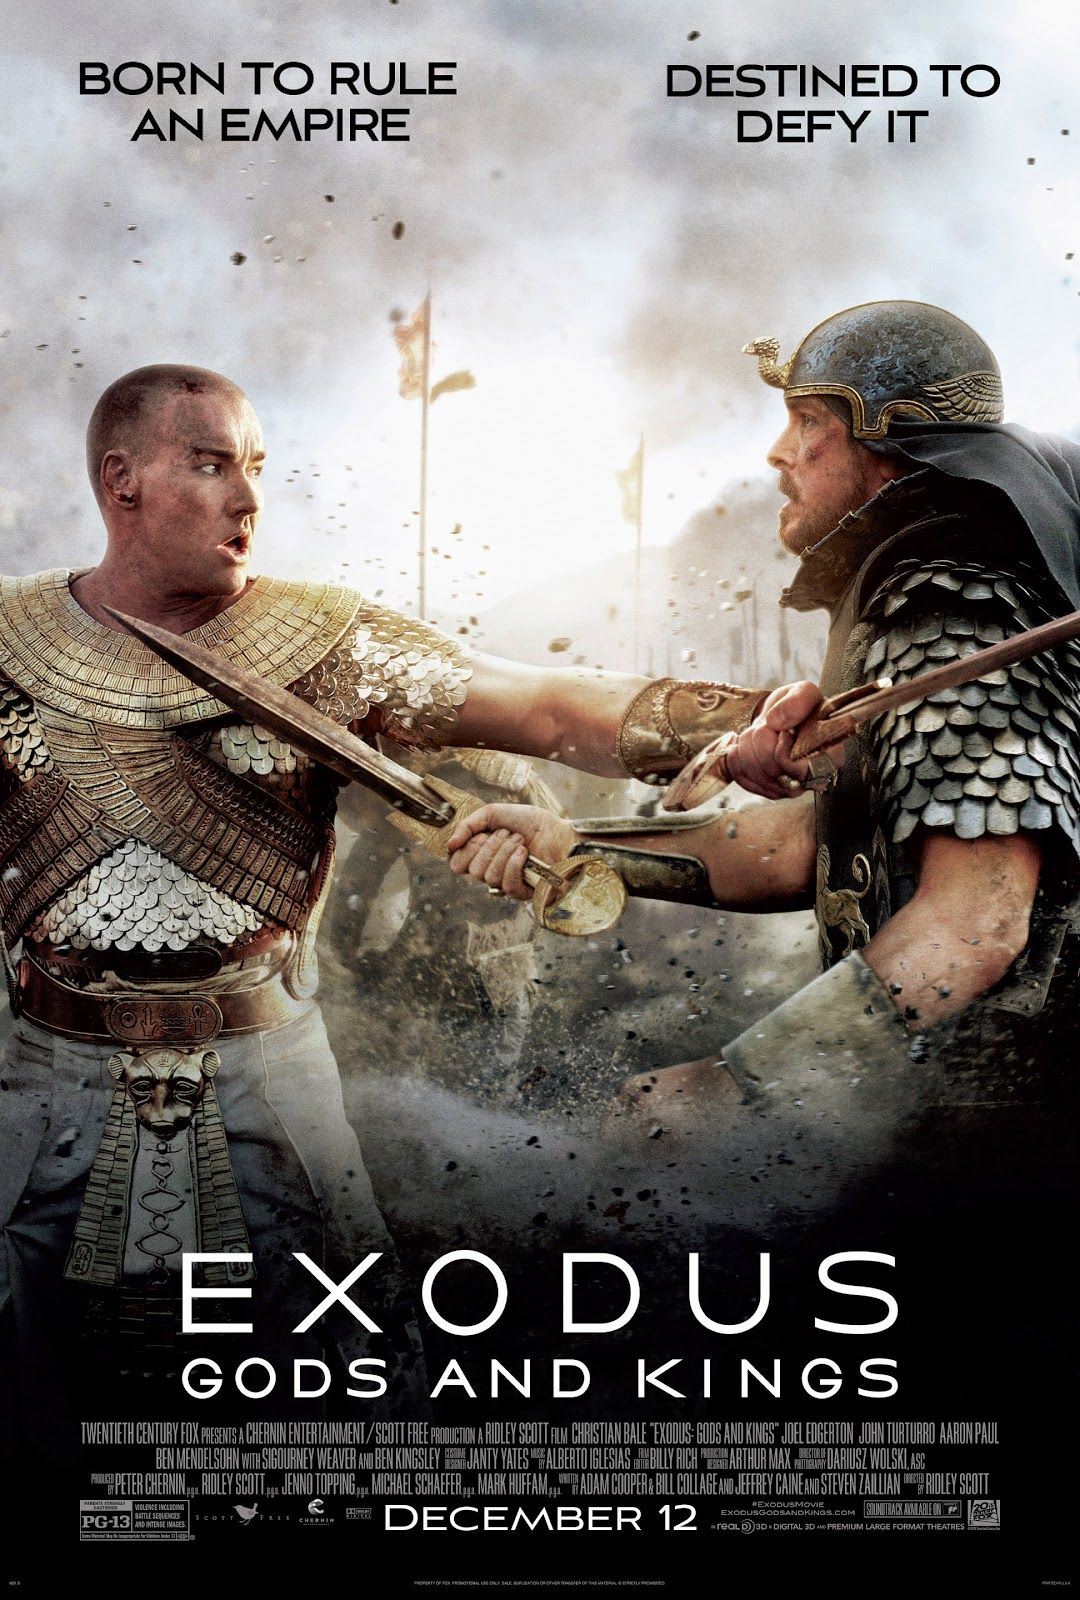 Exodus Gods And Kings 2014 Kings Movie Exodus Full Movies Online Free